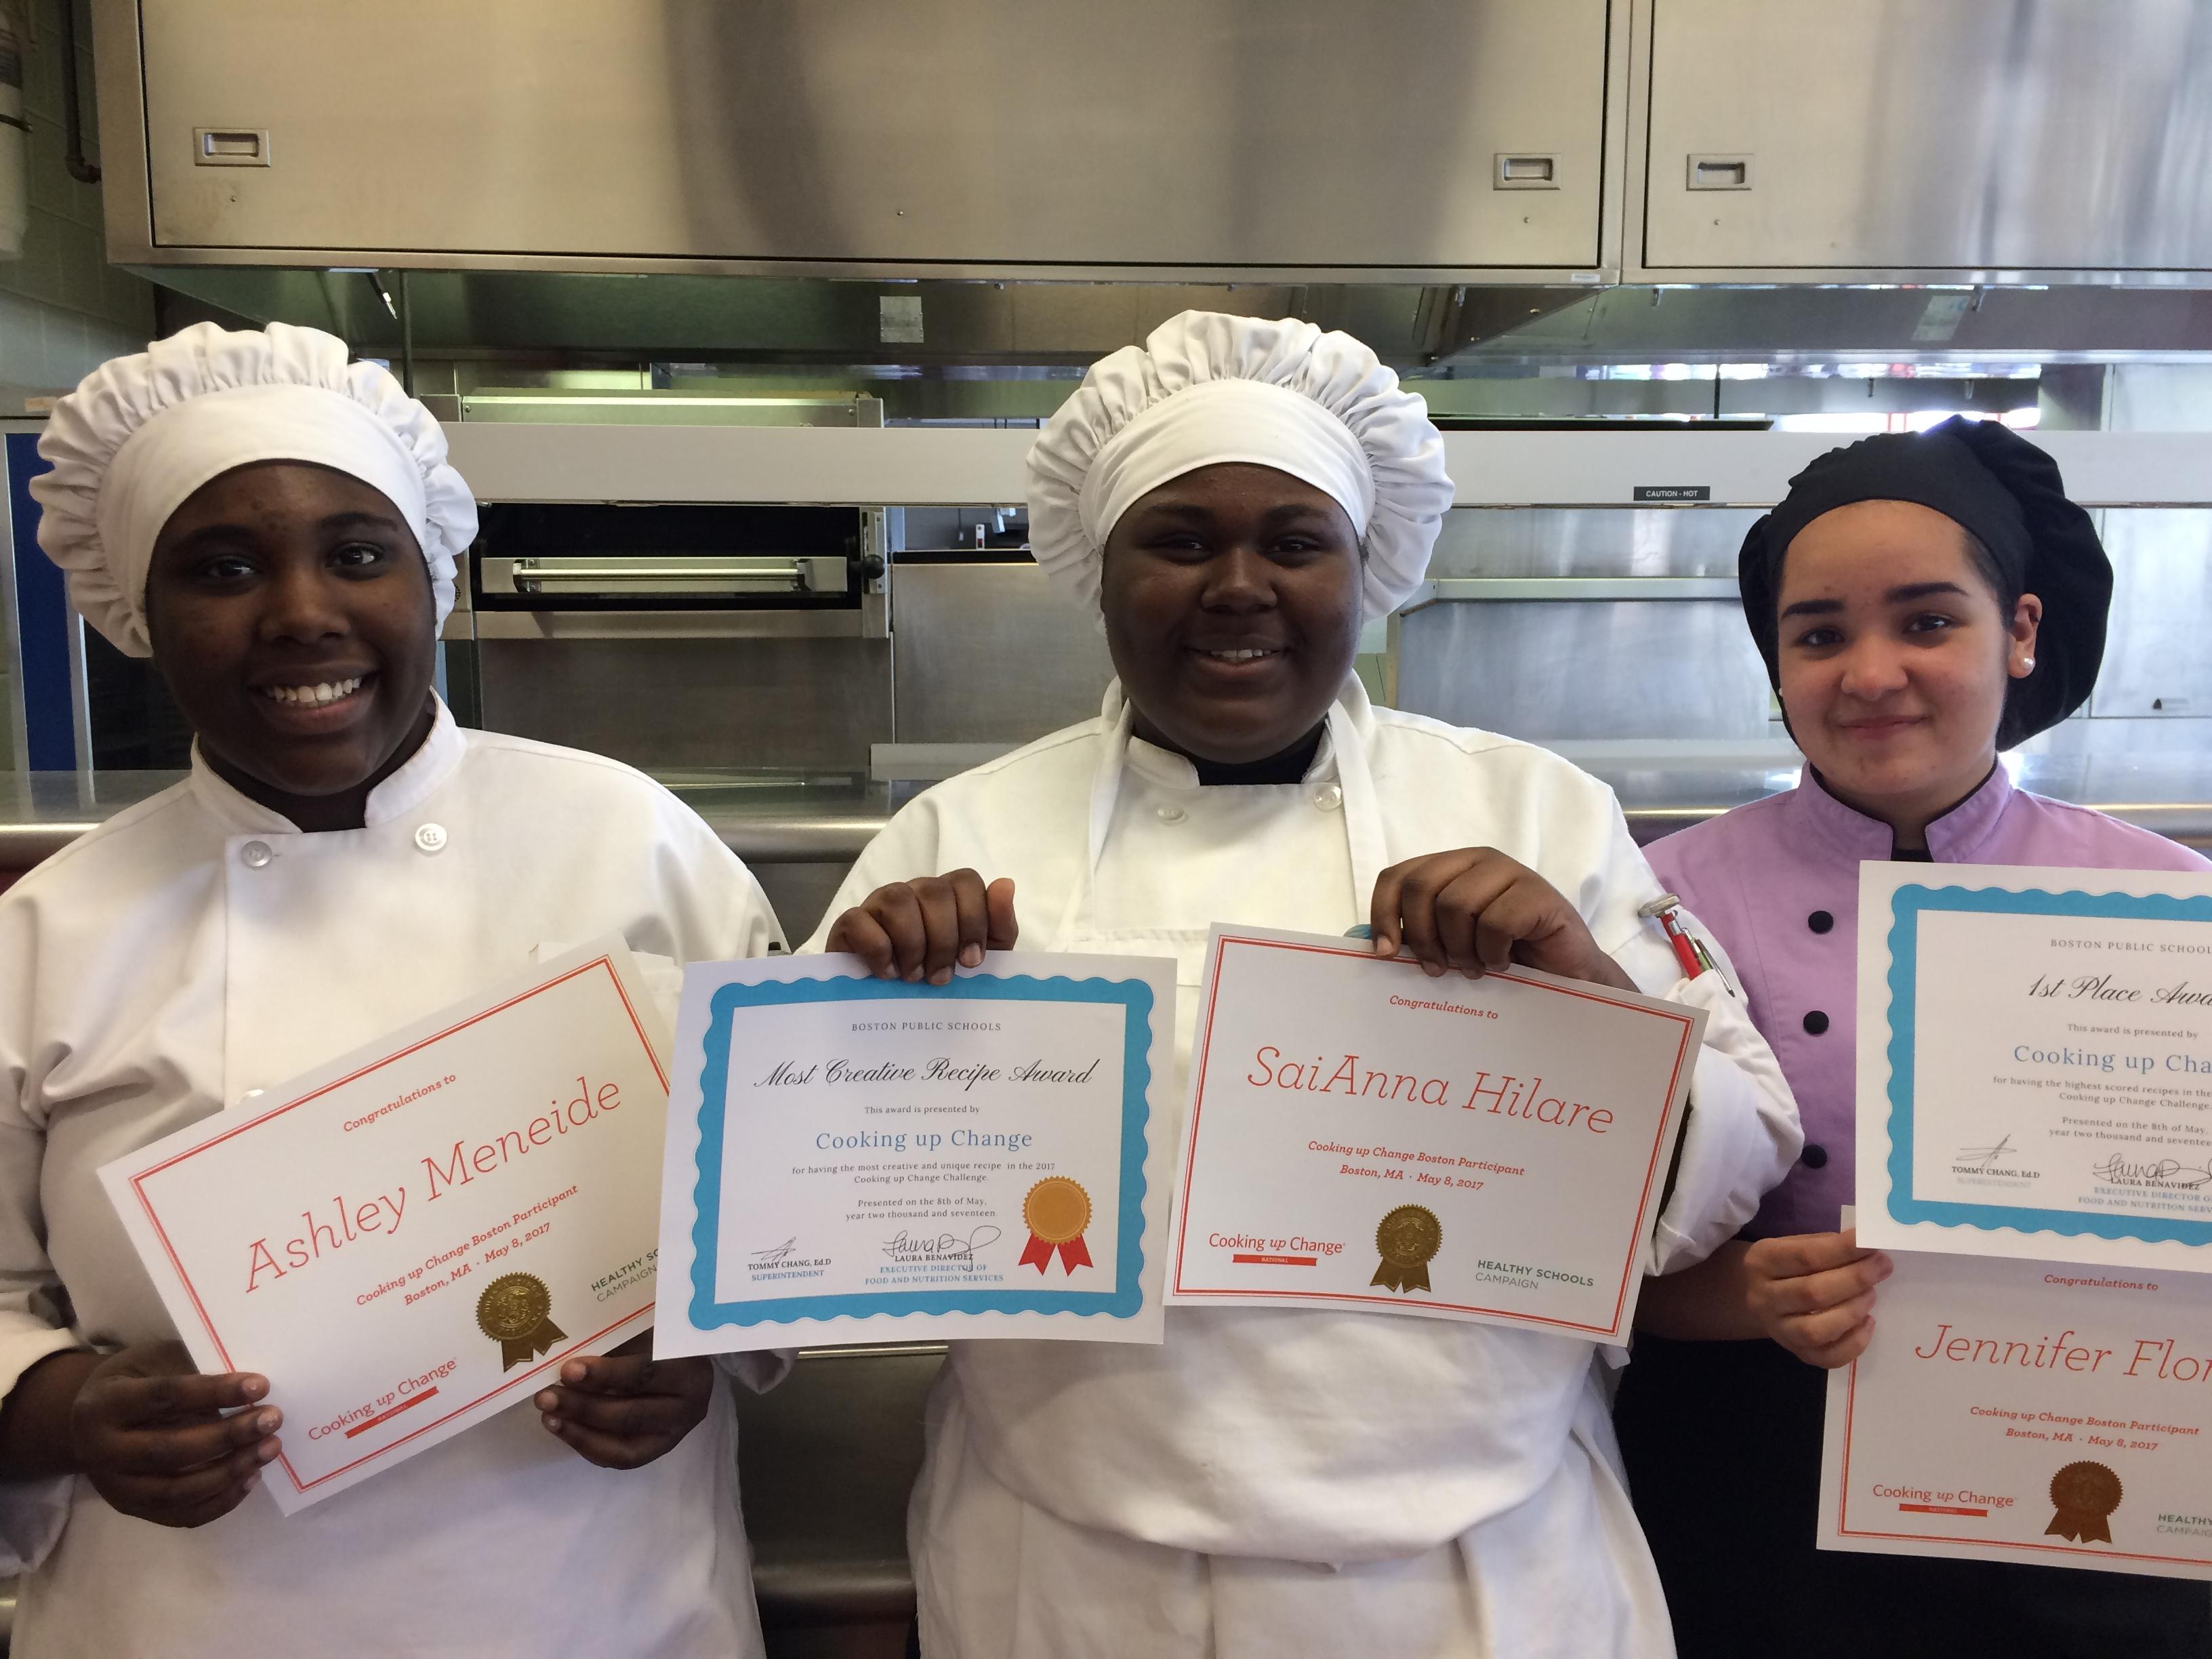 Jennifer Flores, Ashley Meneide y SaiAnna Hilare mostrando sus diplomas